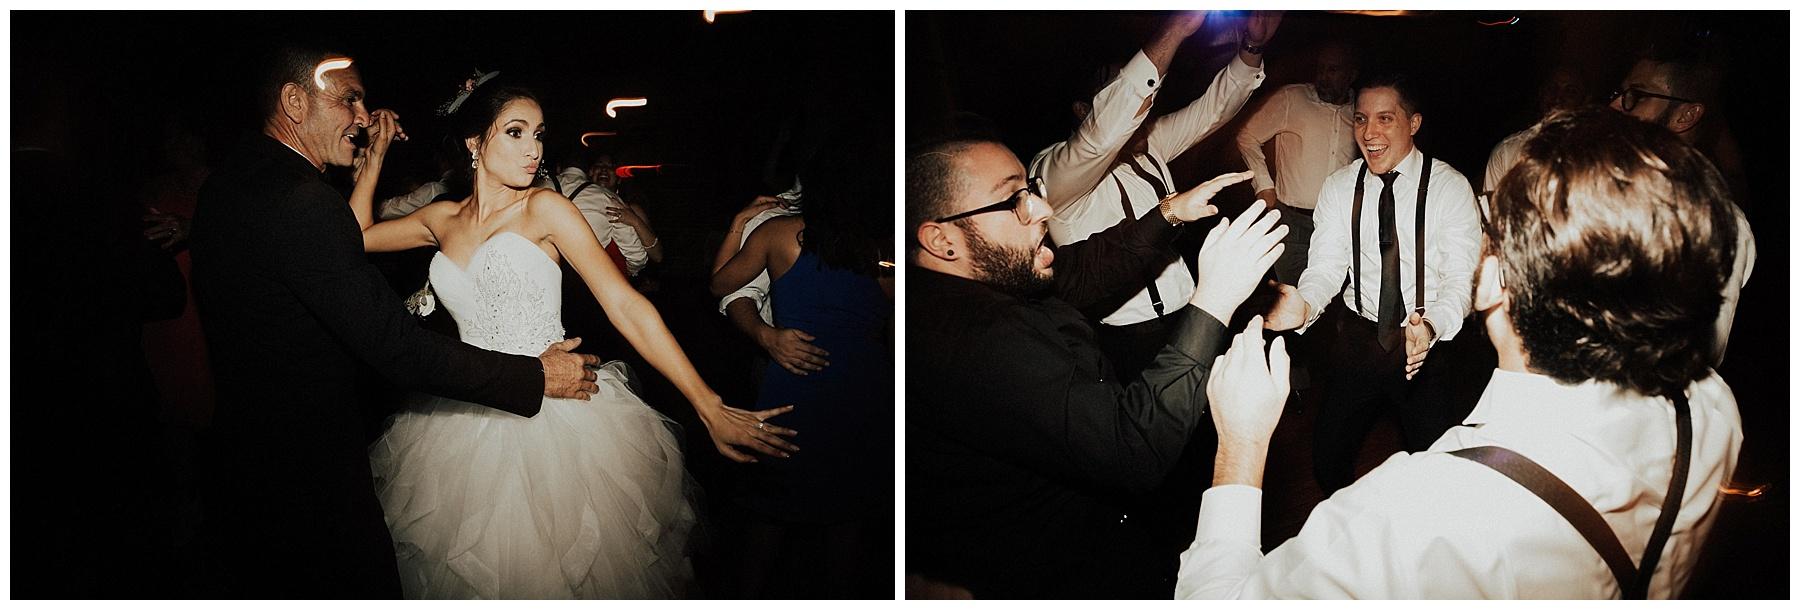 YBOR Wedding Tampa Wedding Photographer-115.jpg